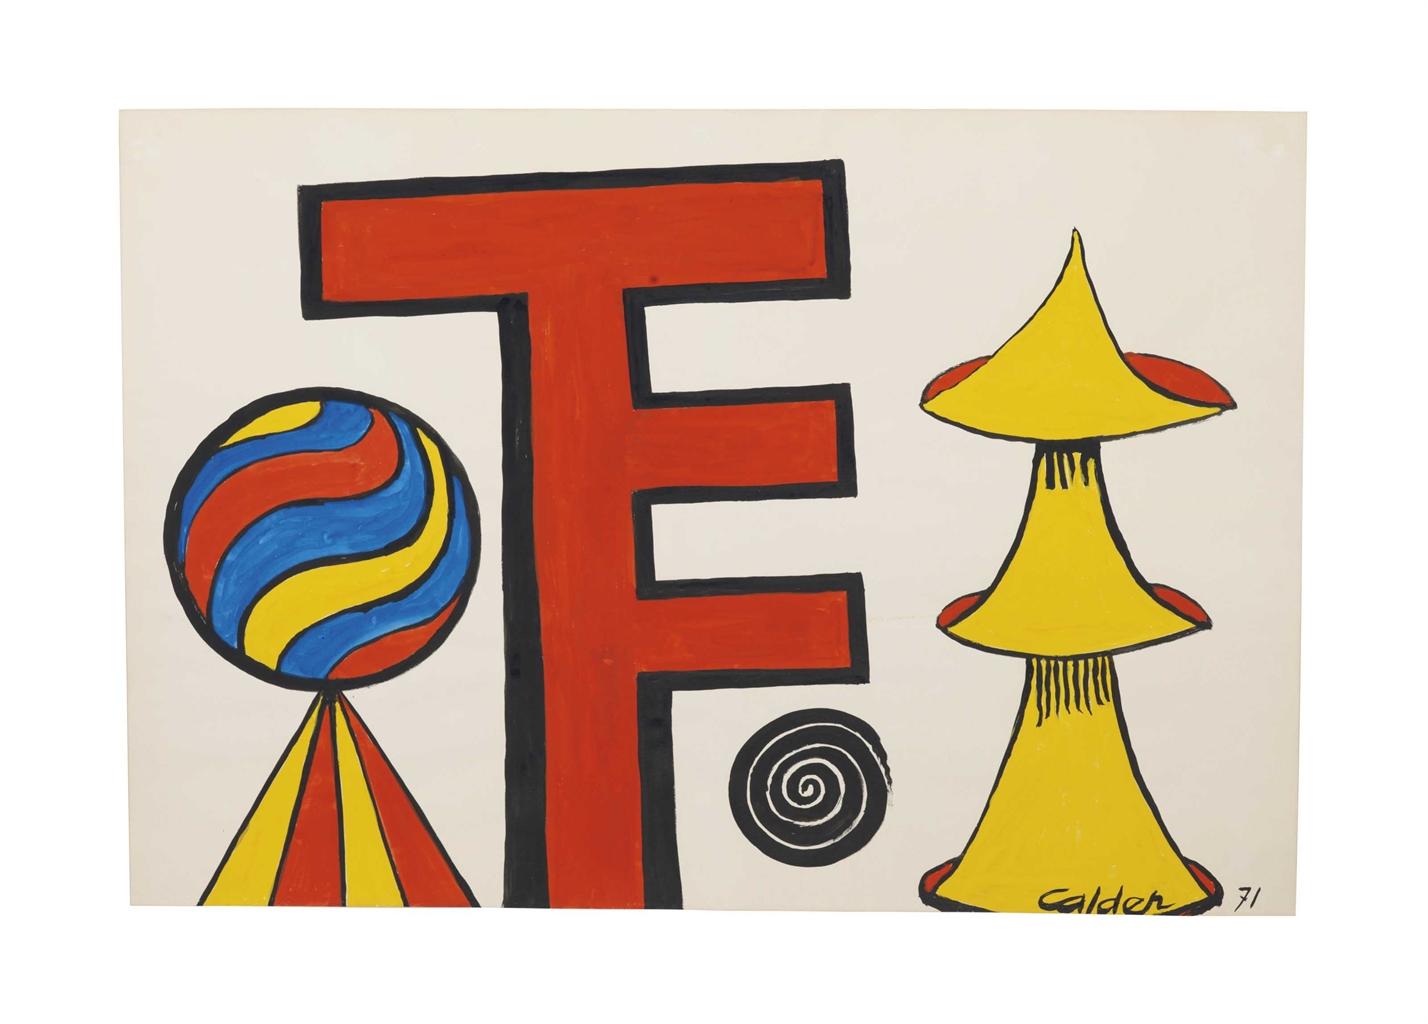 Alexander Calder-Sigle-1971